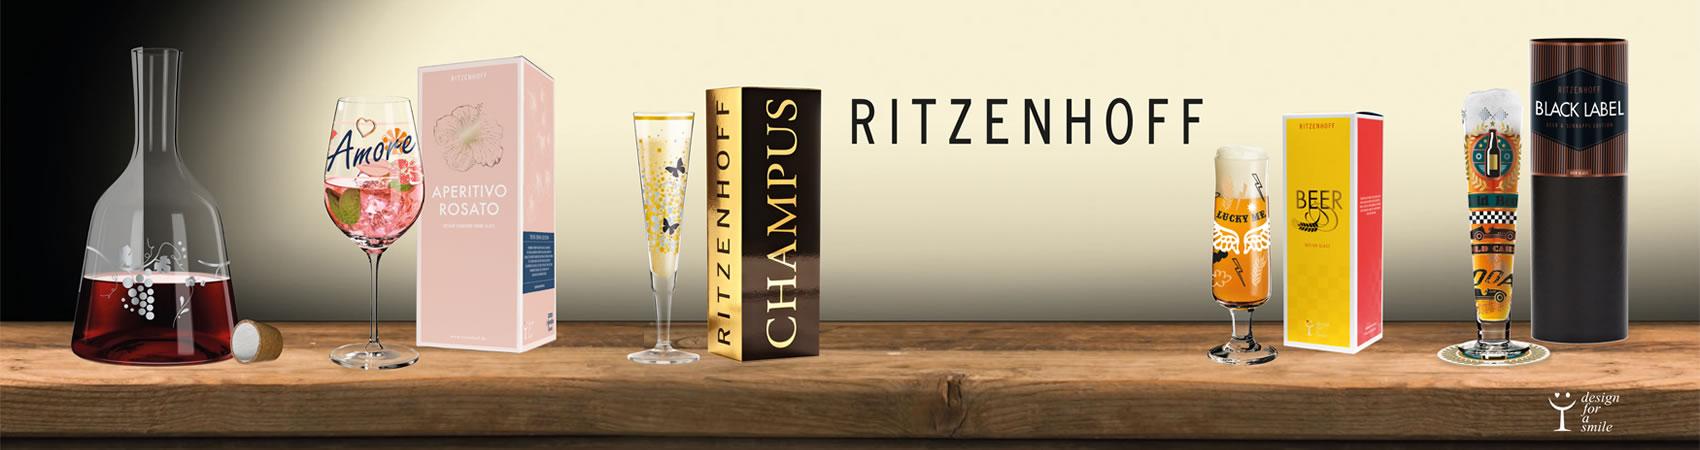 ritzenhoff-design-banner